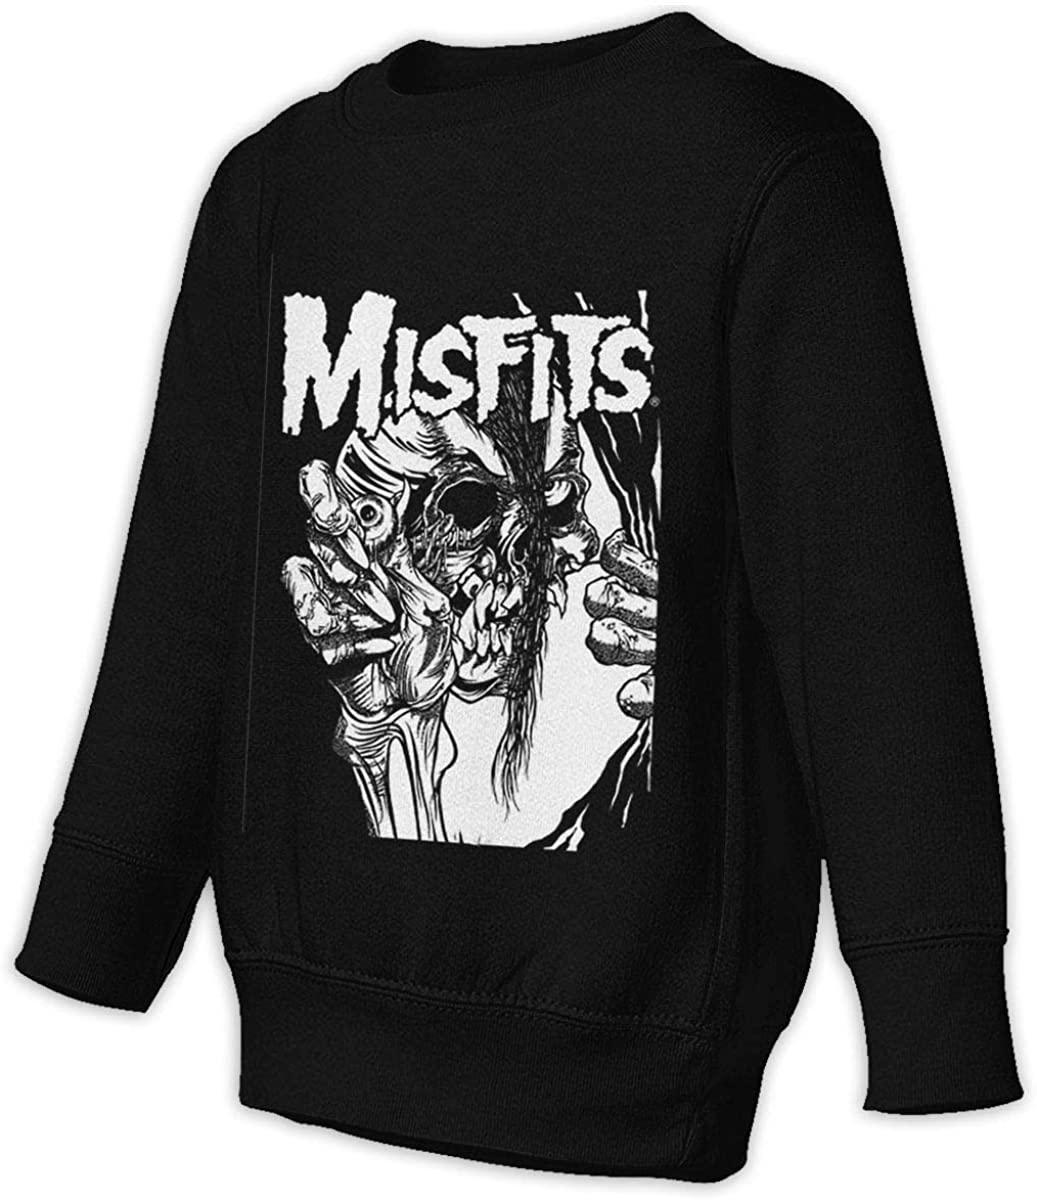 NOT Misfits Distressed Unisex Sweatshirt Youth Boy and Girls Pullover Sweatshirt